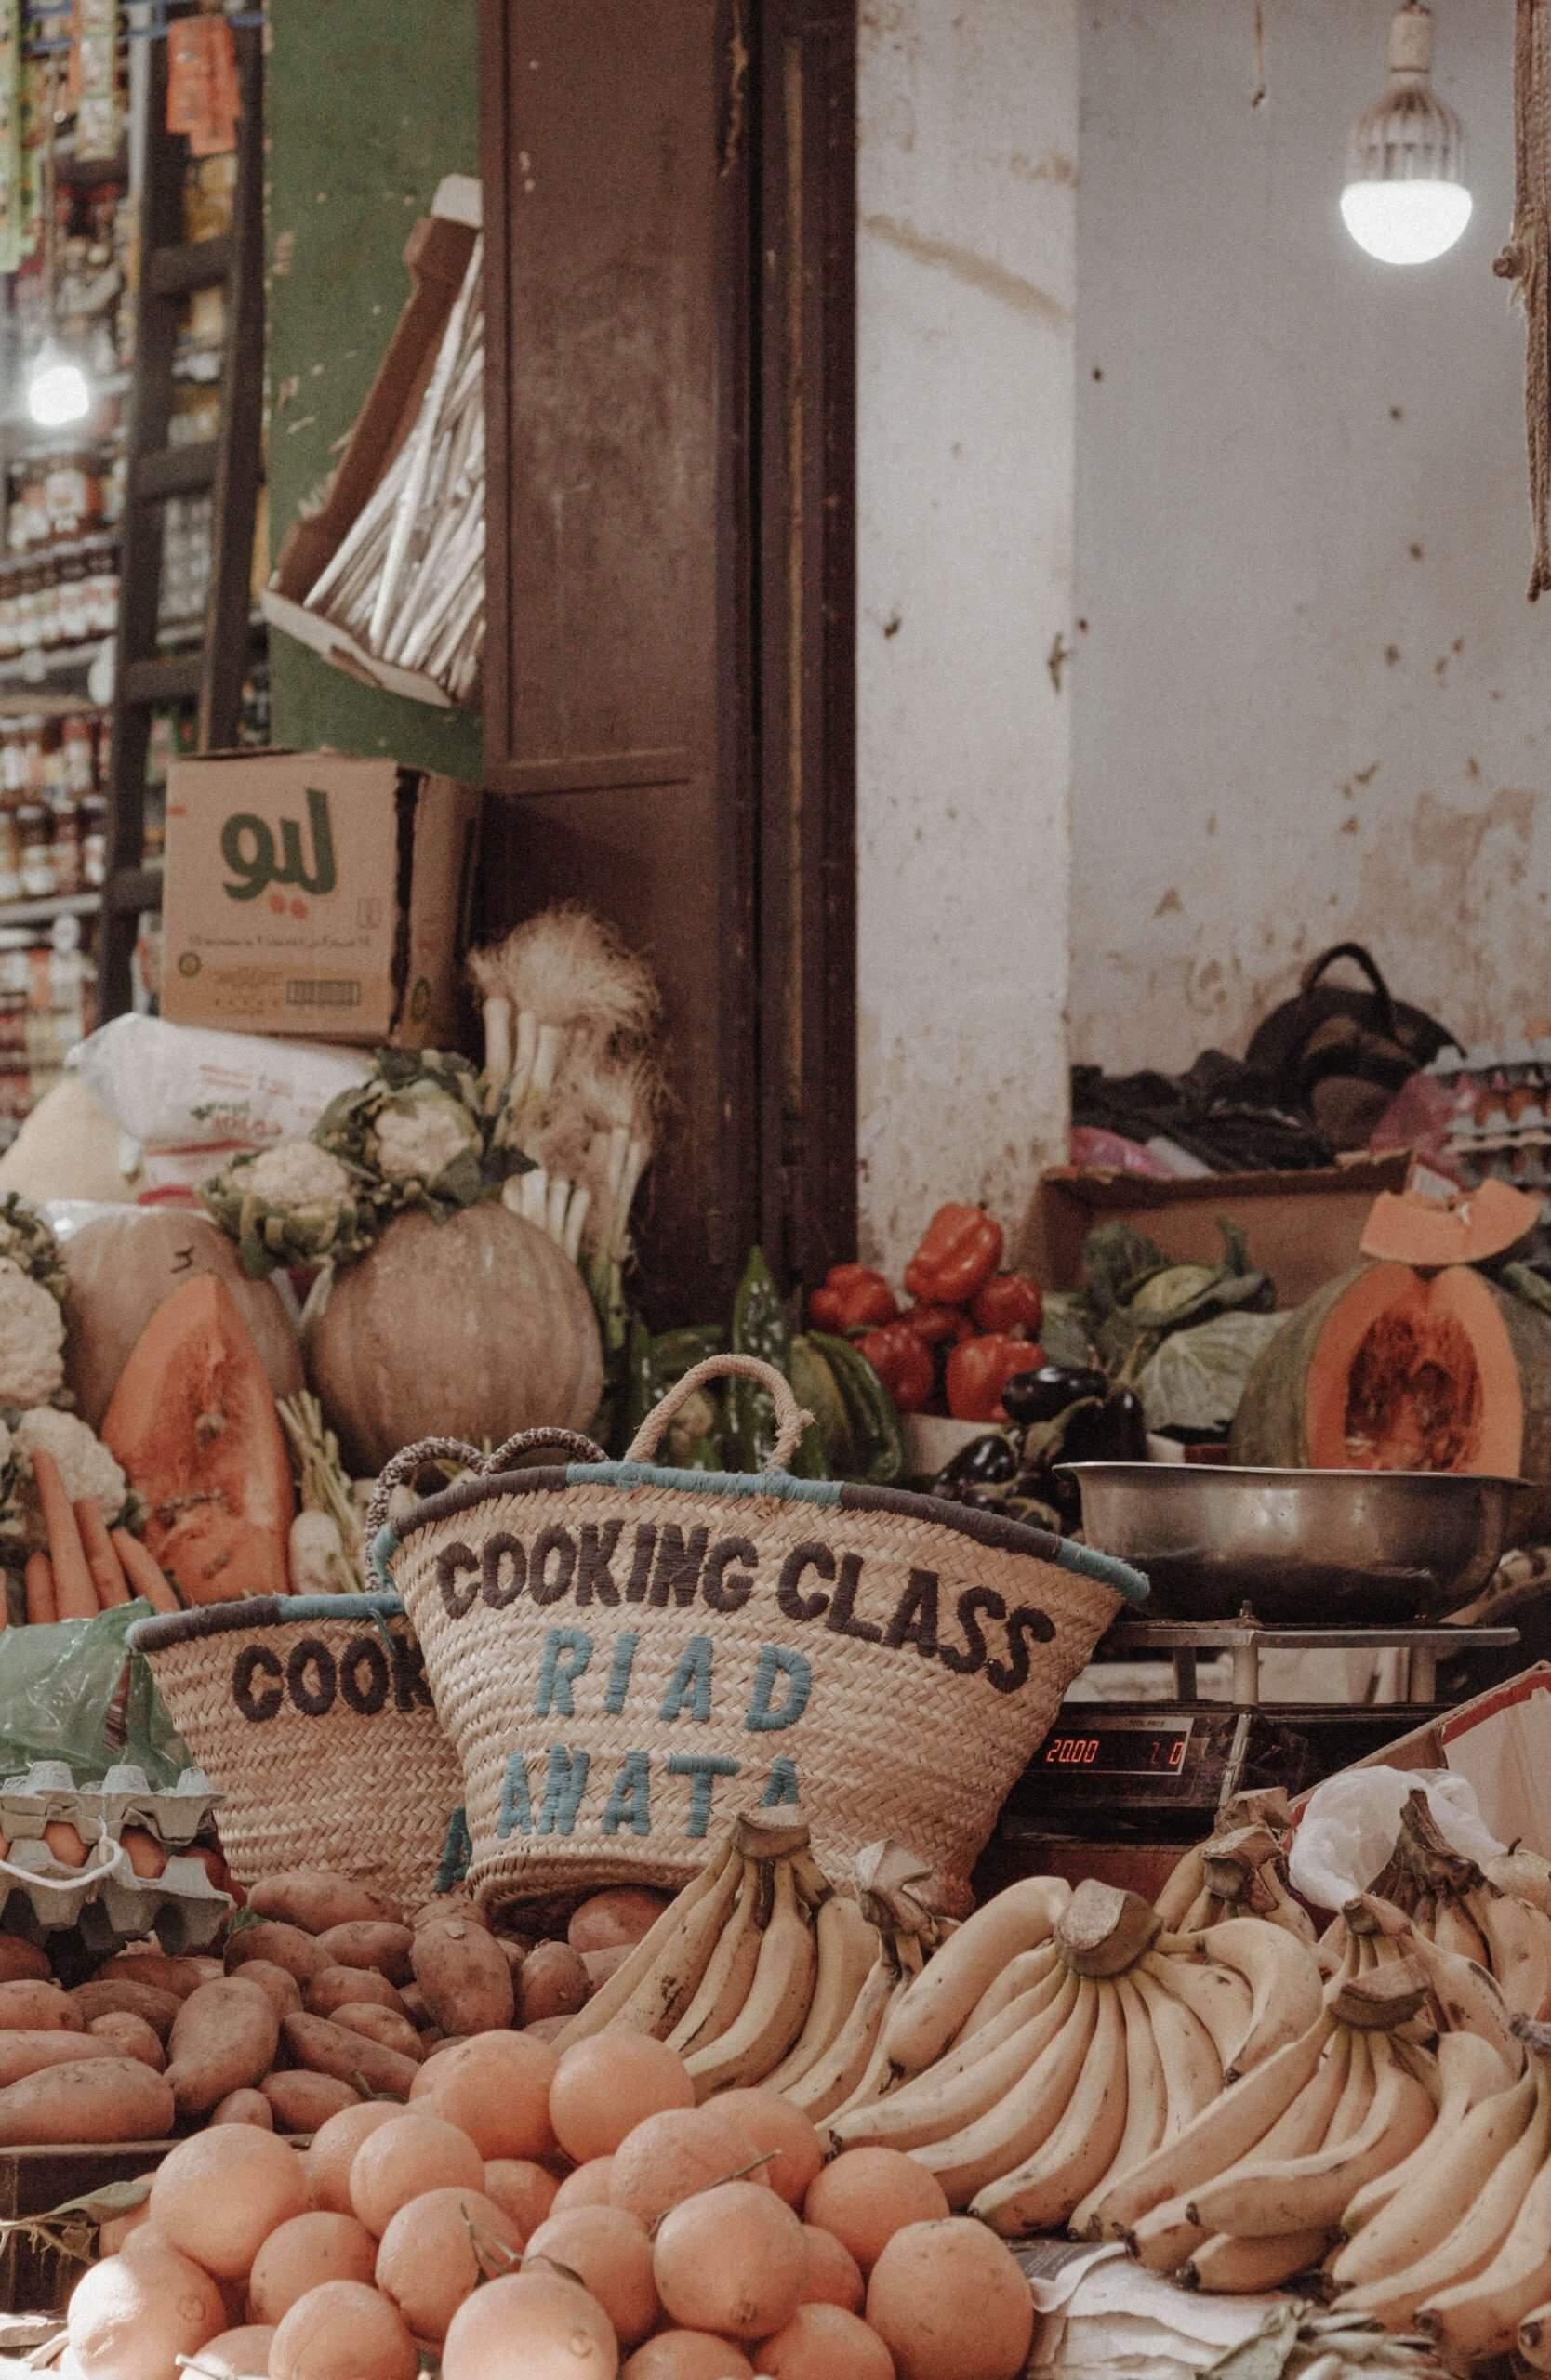 kookcursus in Fez